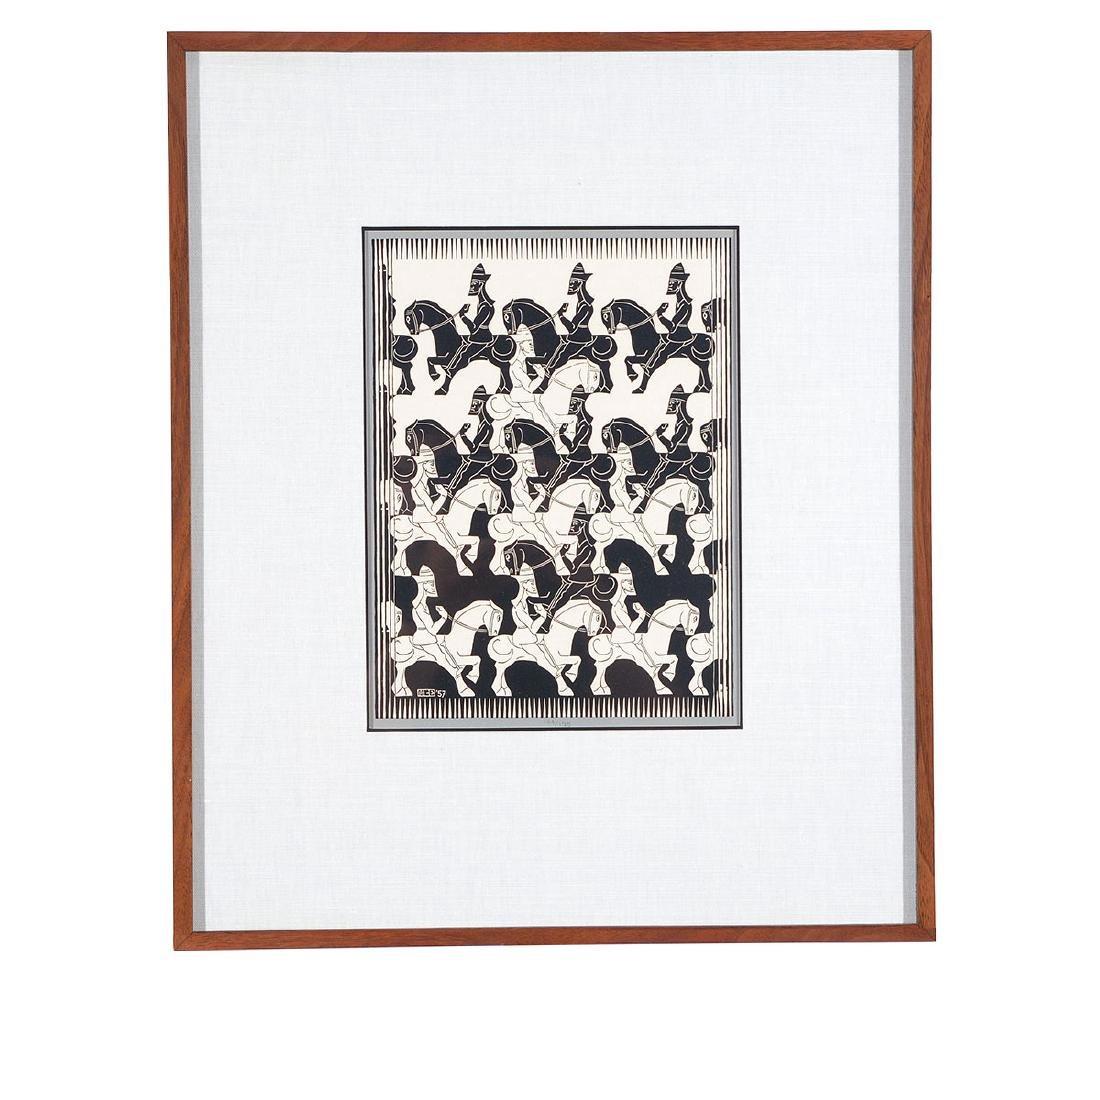 "Escher, 2 ""Regular Division of the Plane III"" woodcuts - 5"